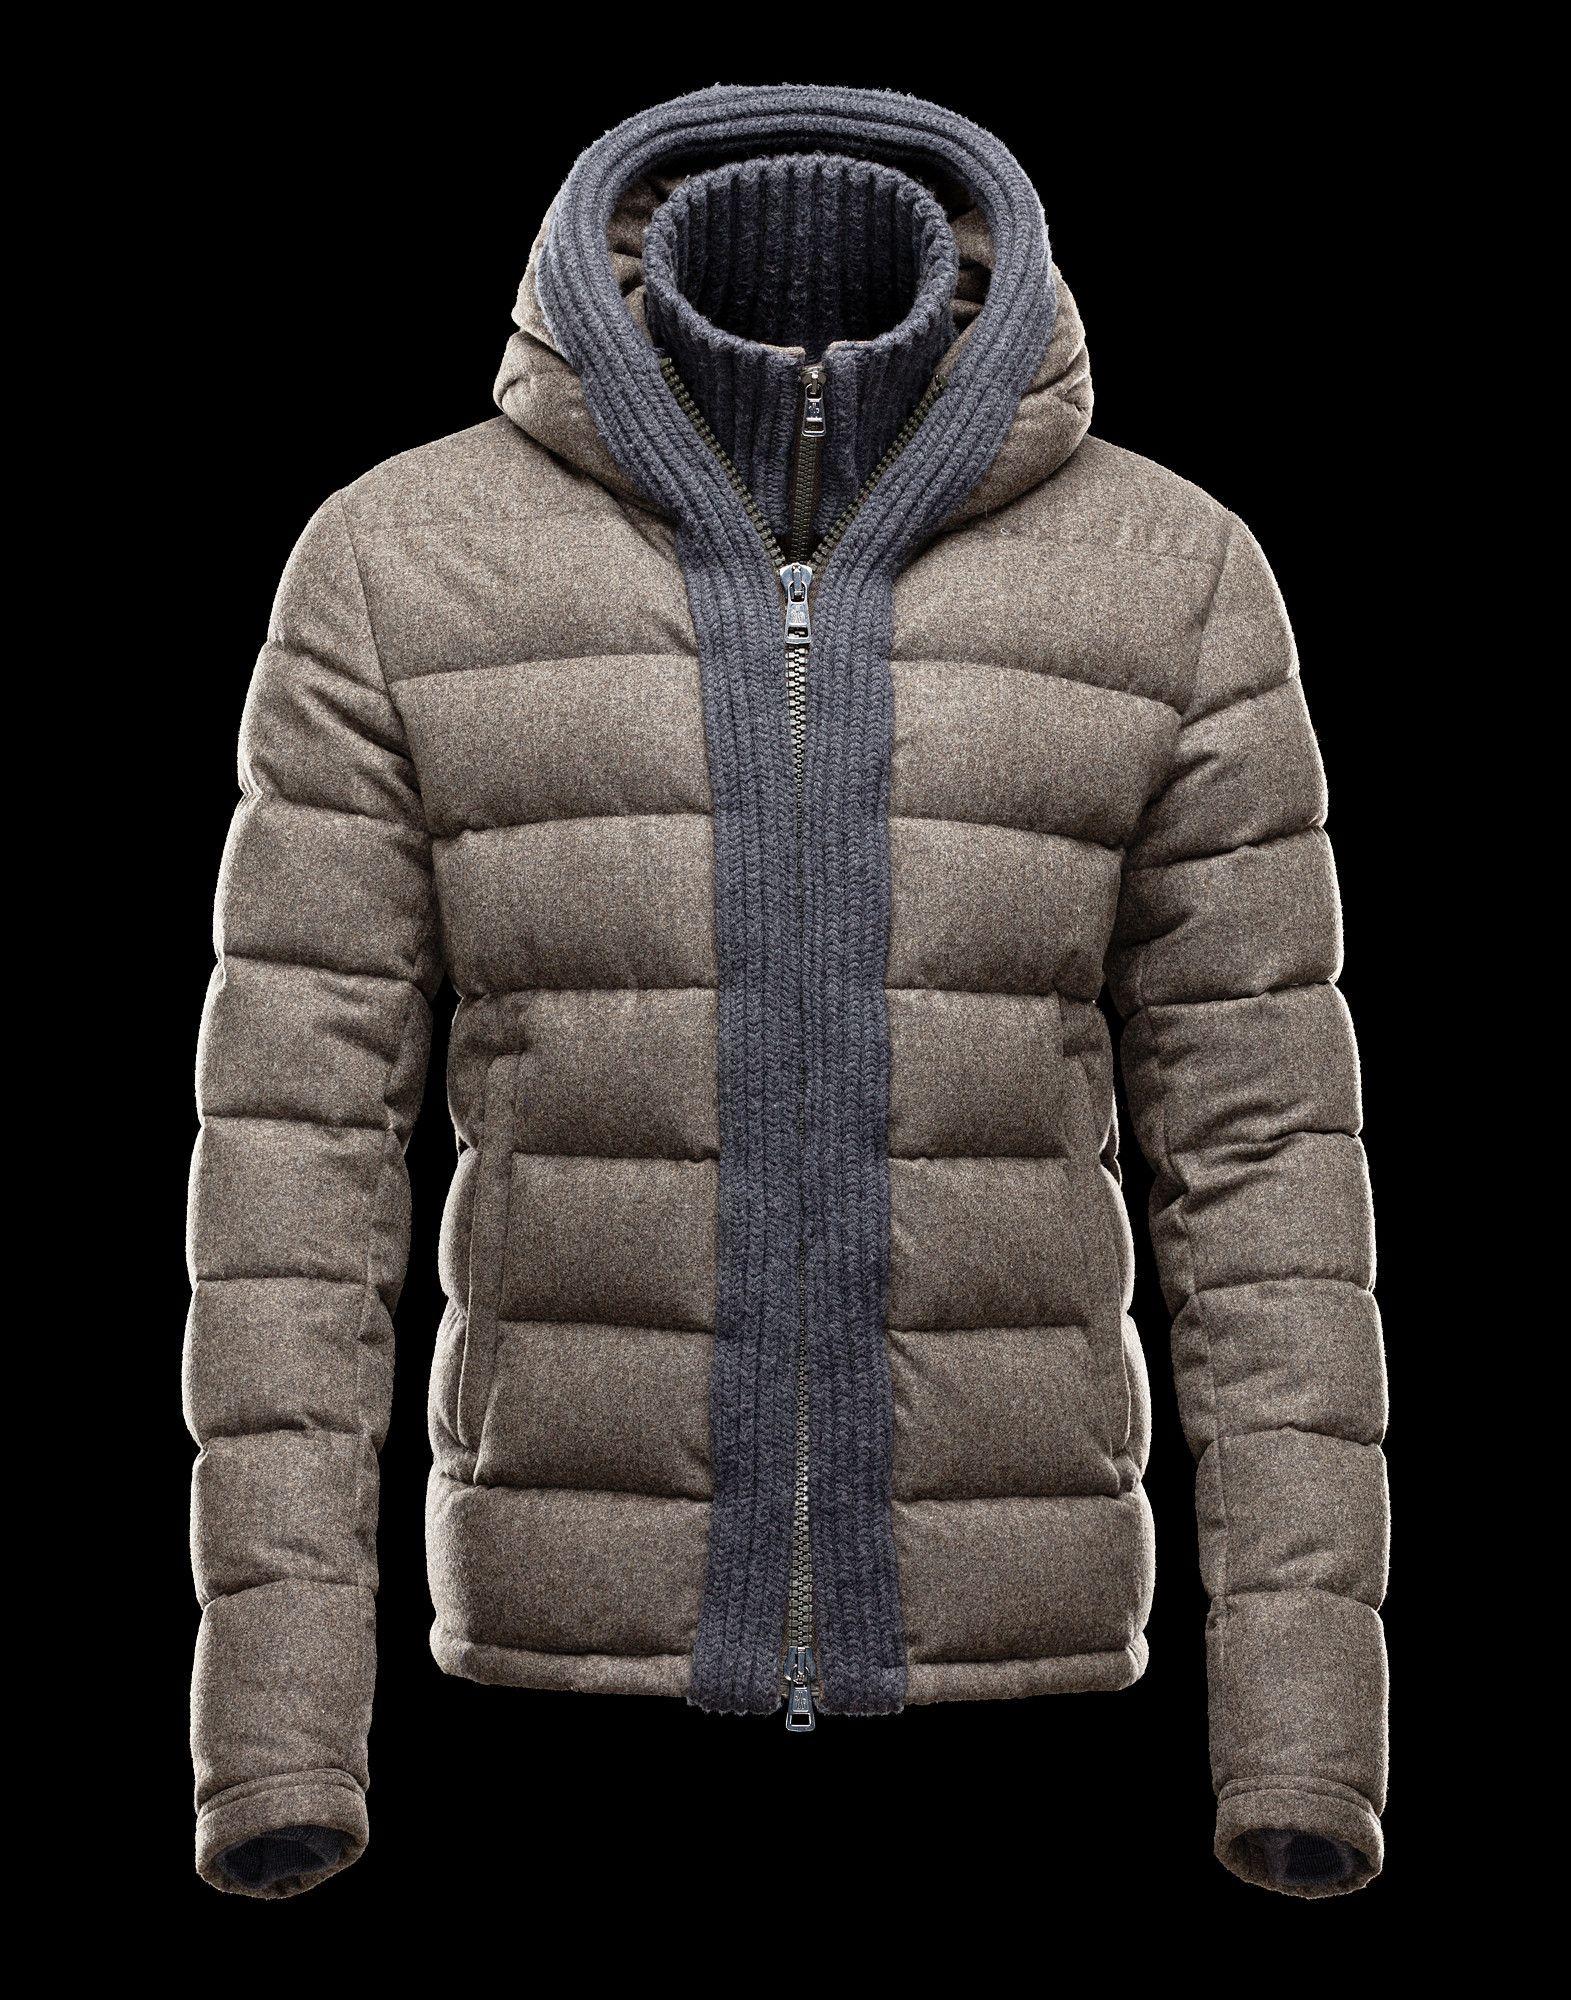 Jacket Men Outerwear Men on Moncler Online Store 1,695